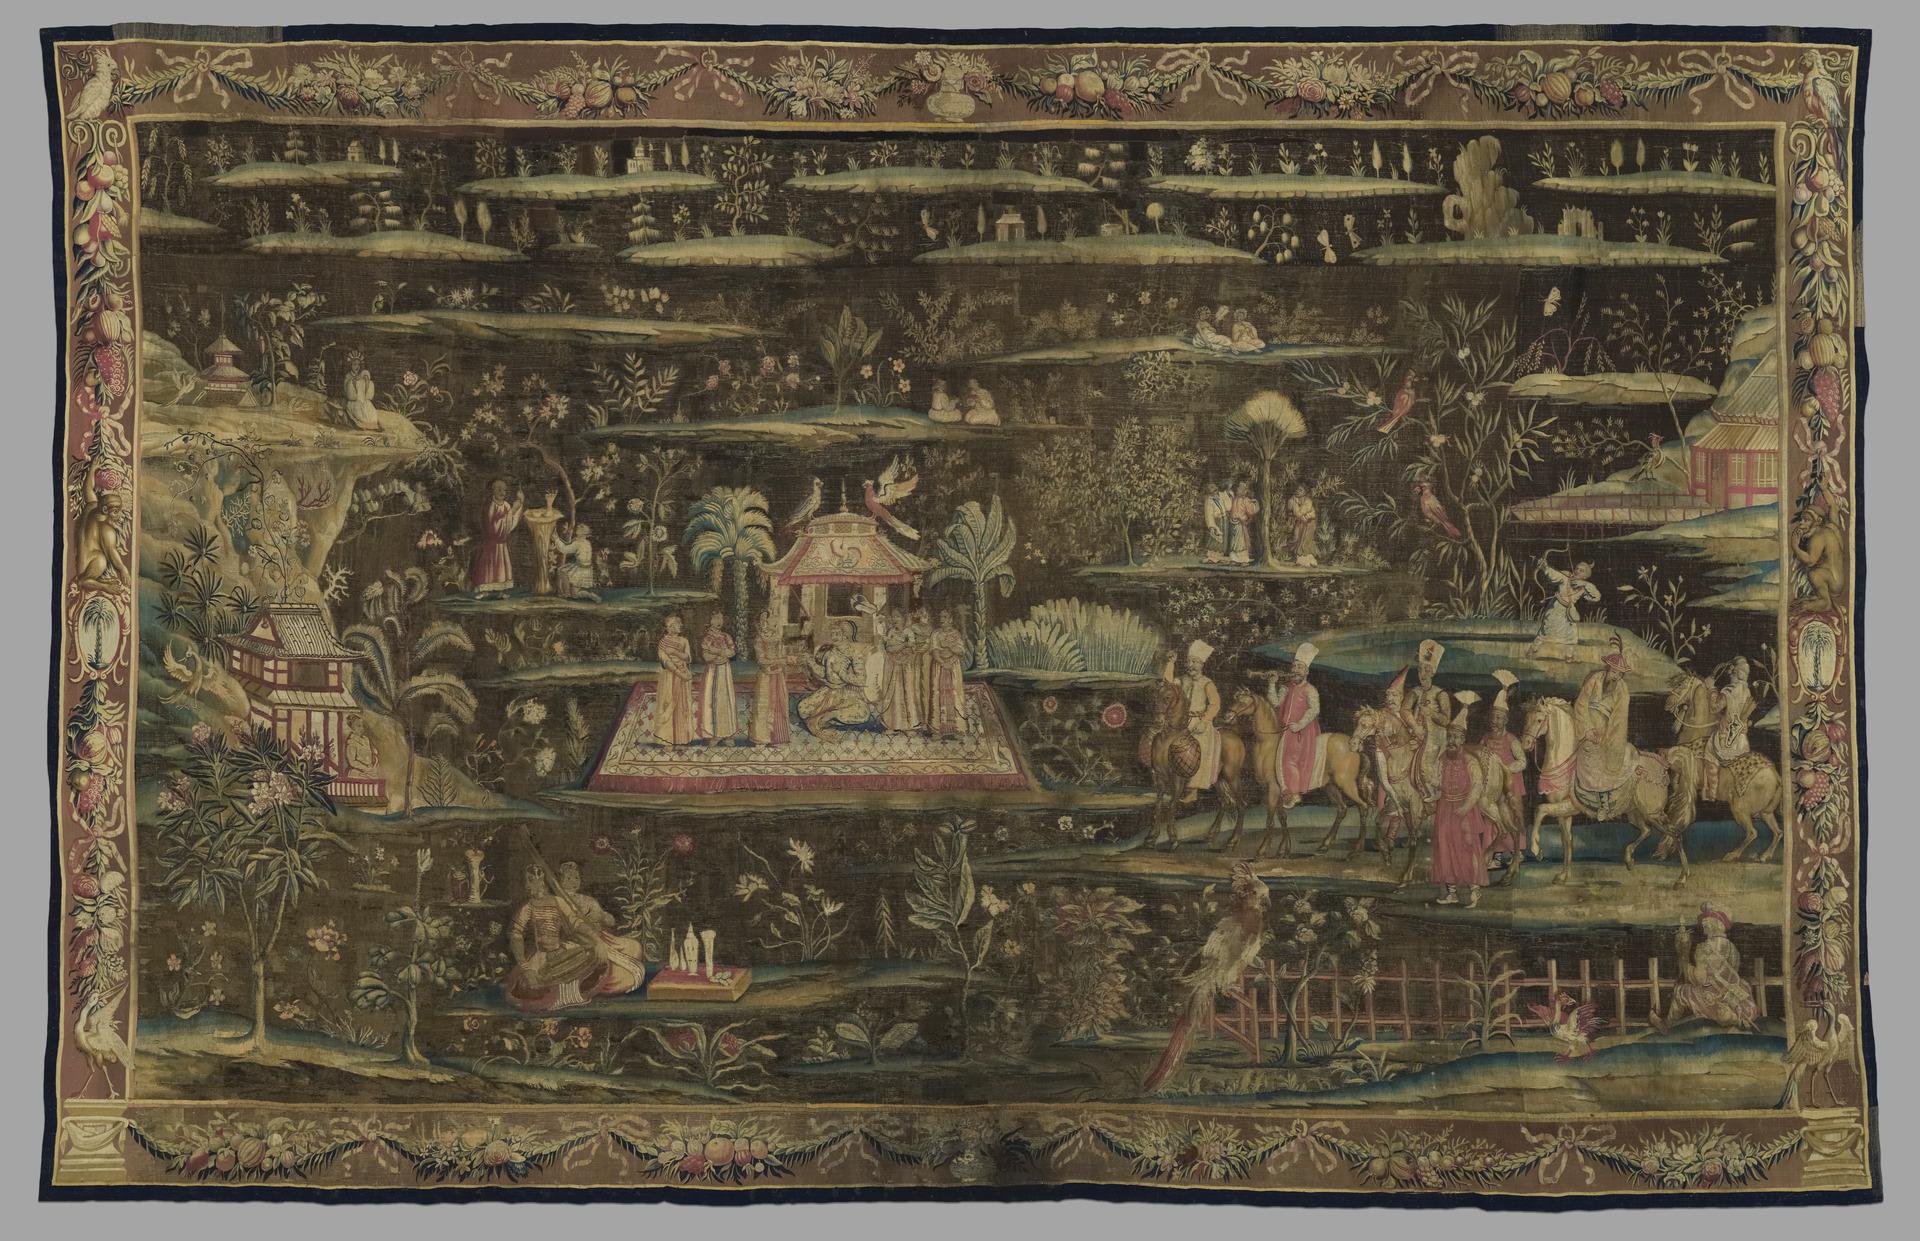 John Vanderbank the Elder, The Concert, ca. 1700, wool and silk, Yale University Art Gallery, Gift of Edward S. Harkness, BA 1897